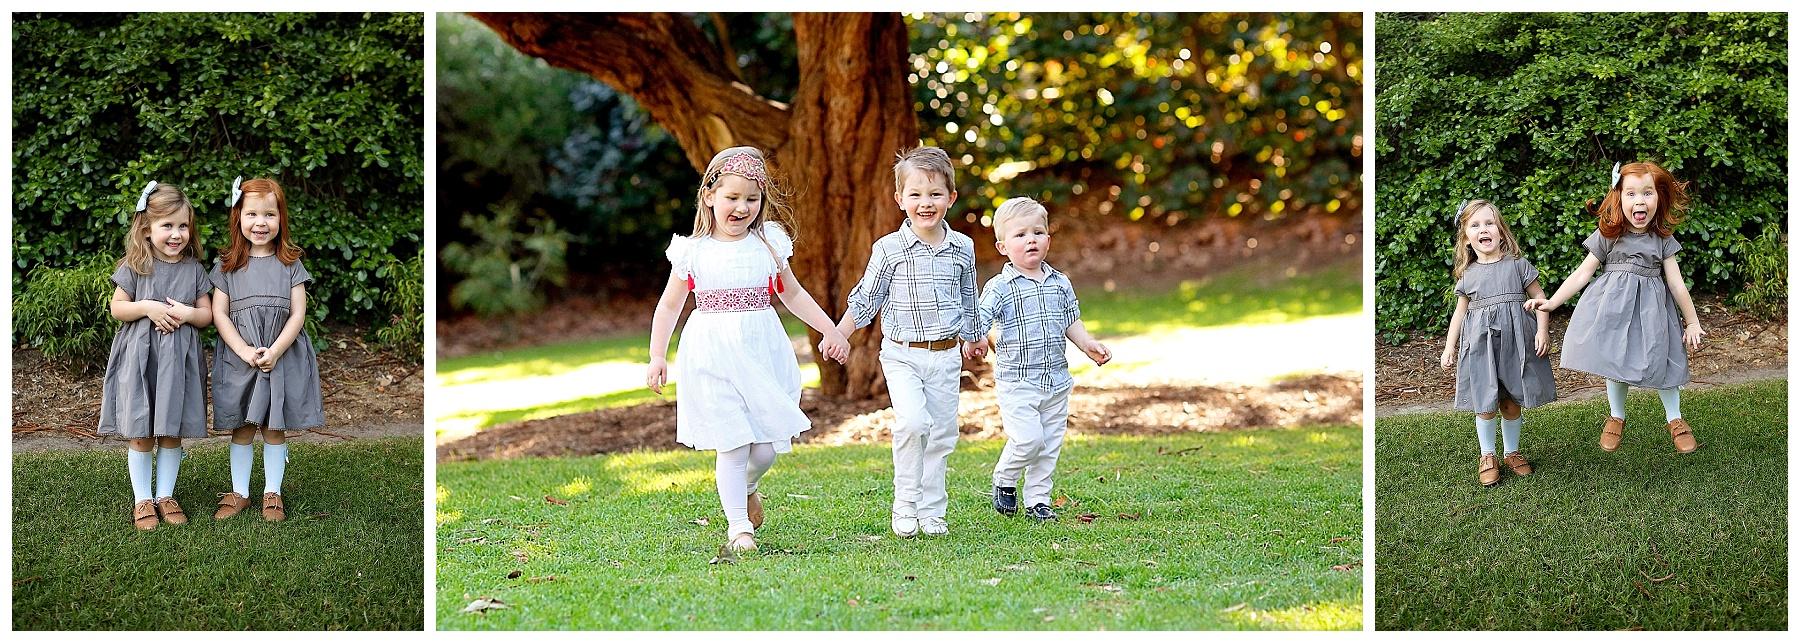 Kids Photographer Cottesloe